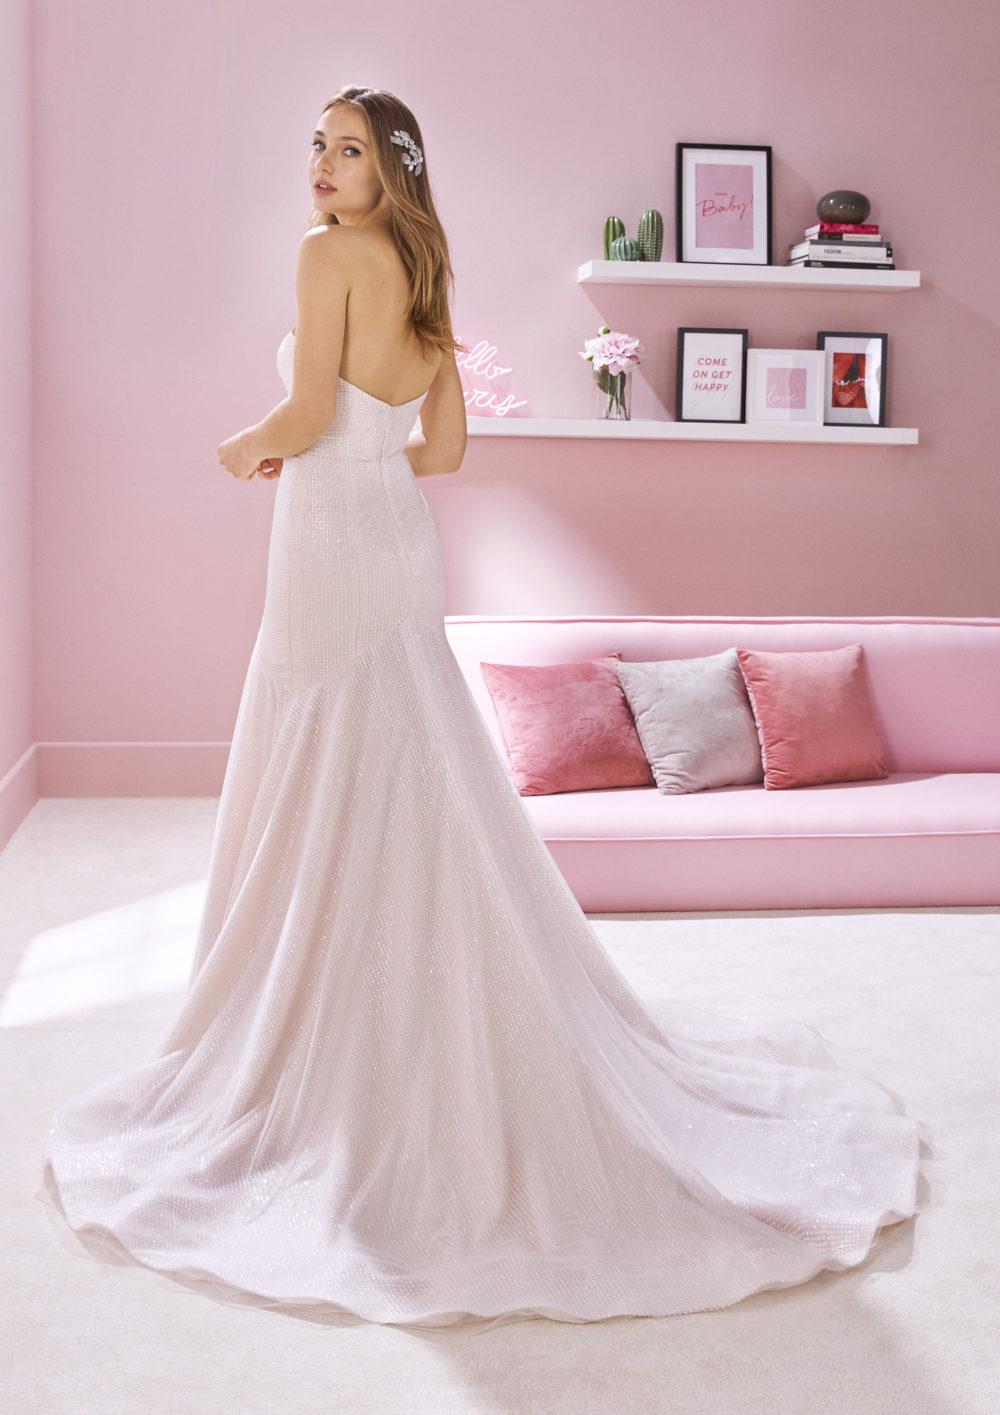 MMariages: abito da sposa Poème 2020 a Vicenza, Verona, Padova, Veneto DEBBIE